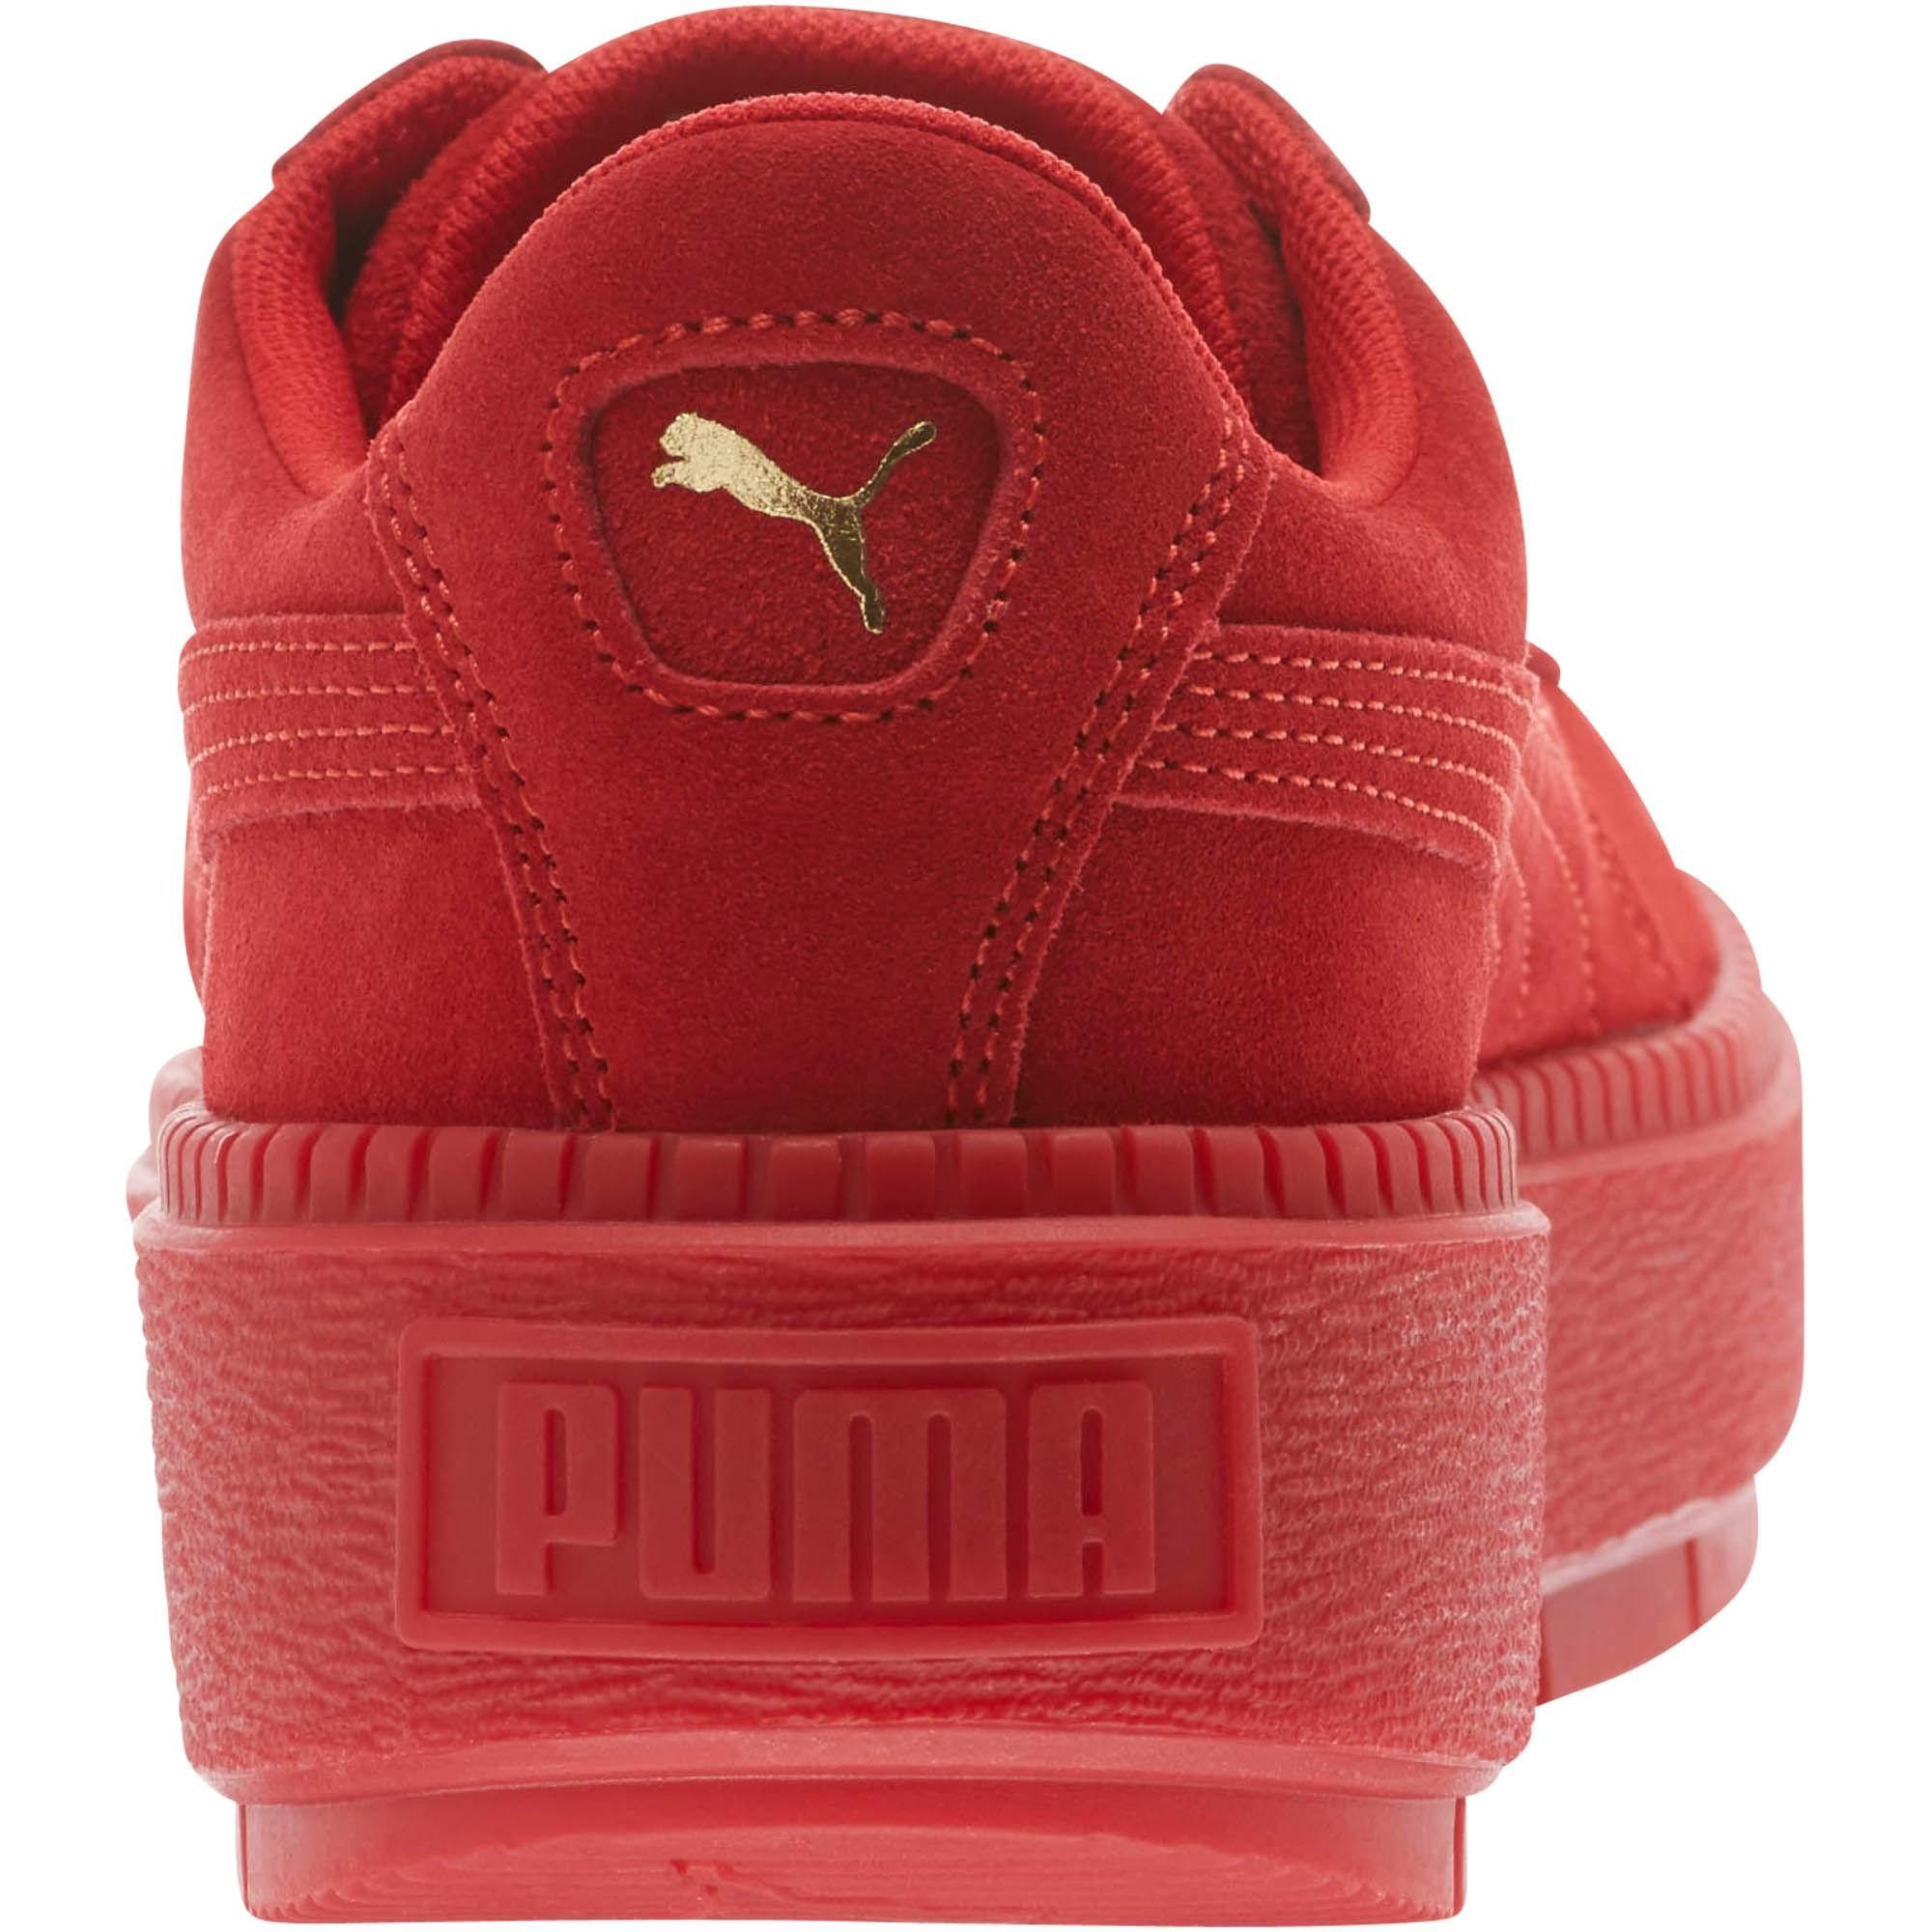 a3b154c7b83e29 Gallery. Women s Platform Sneakers Women s Nike Air Max 90 Women s Puma ...